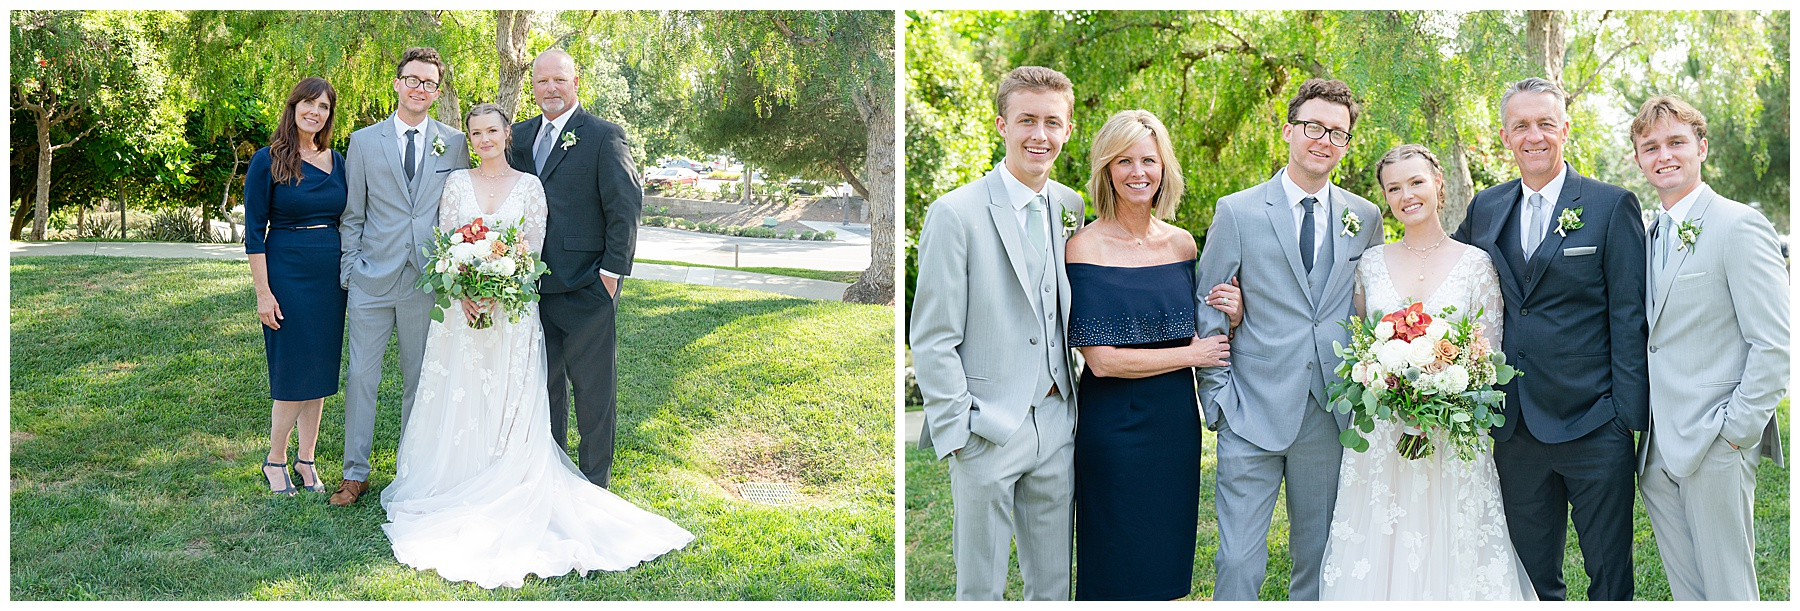 wedding family photo at talega golf club